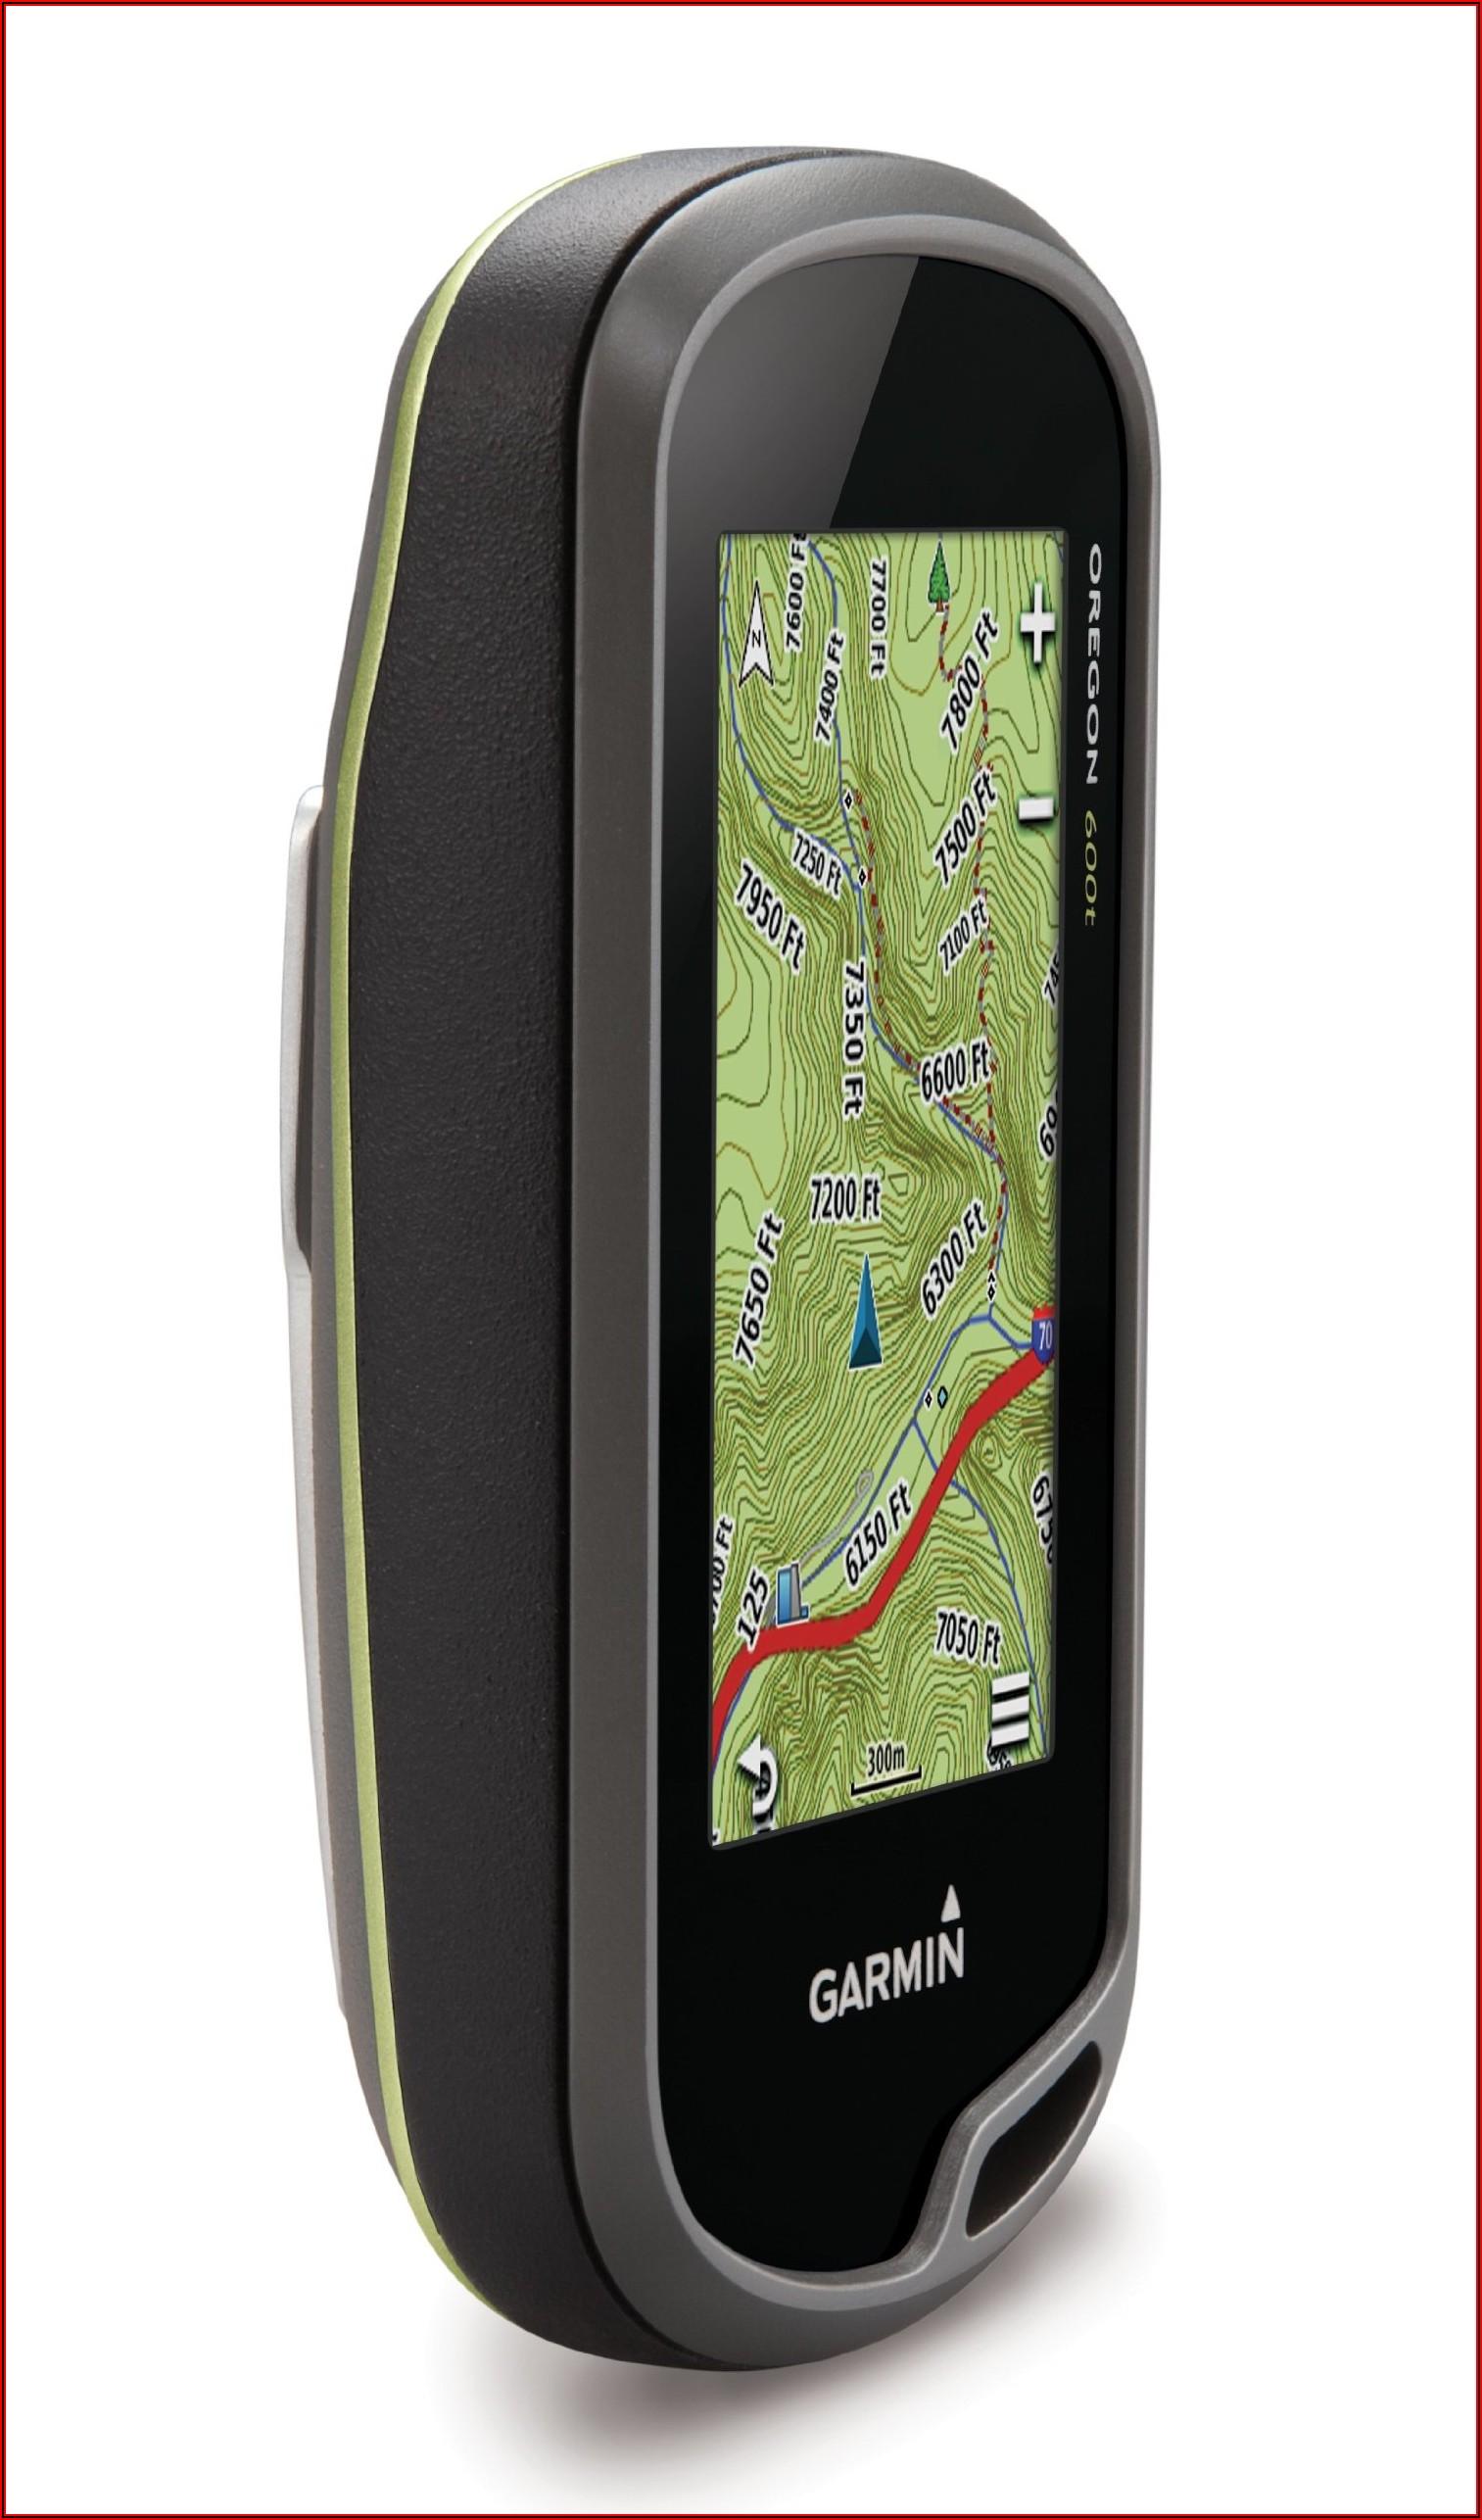 Handheld Gps With Topographic Maps